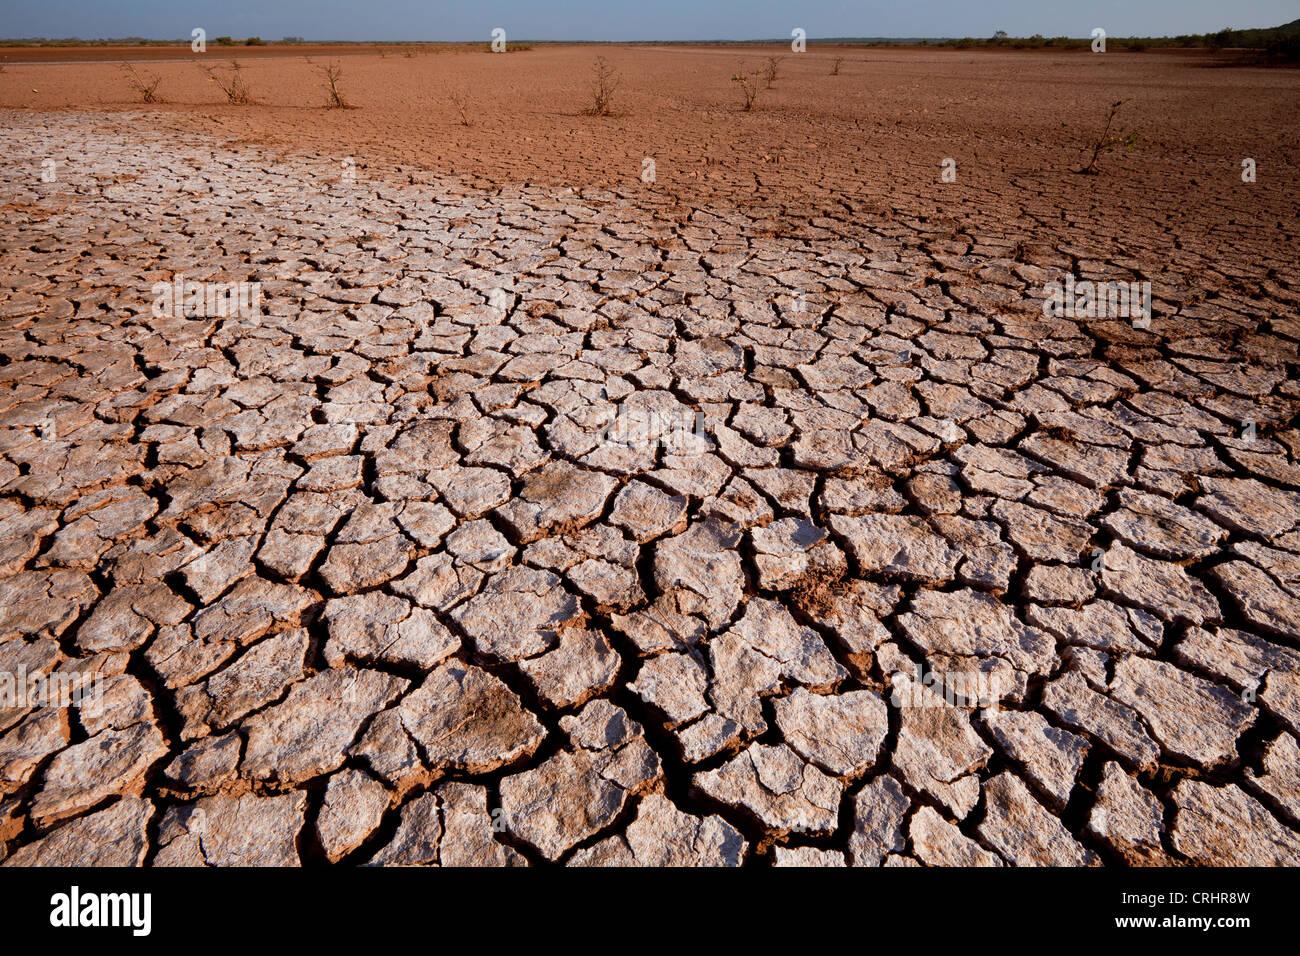 Cracked soil in Sarigua national park (desert), in the Herrera province, Republic of Panama. - Stock Image